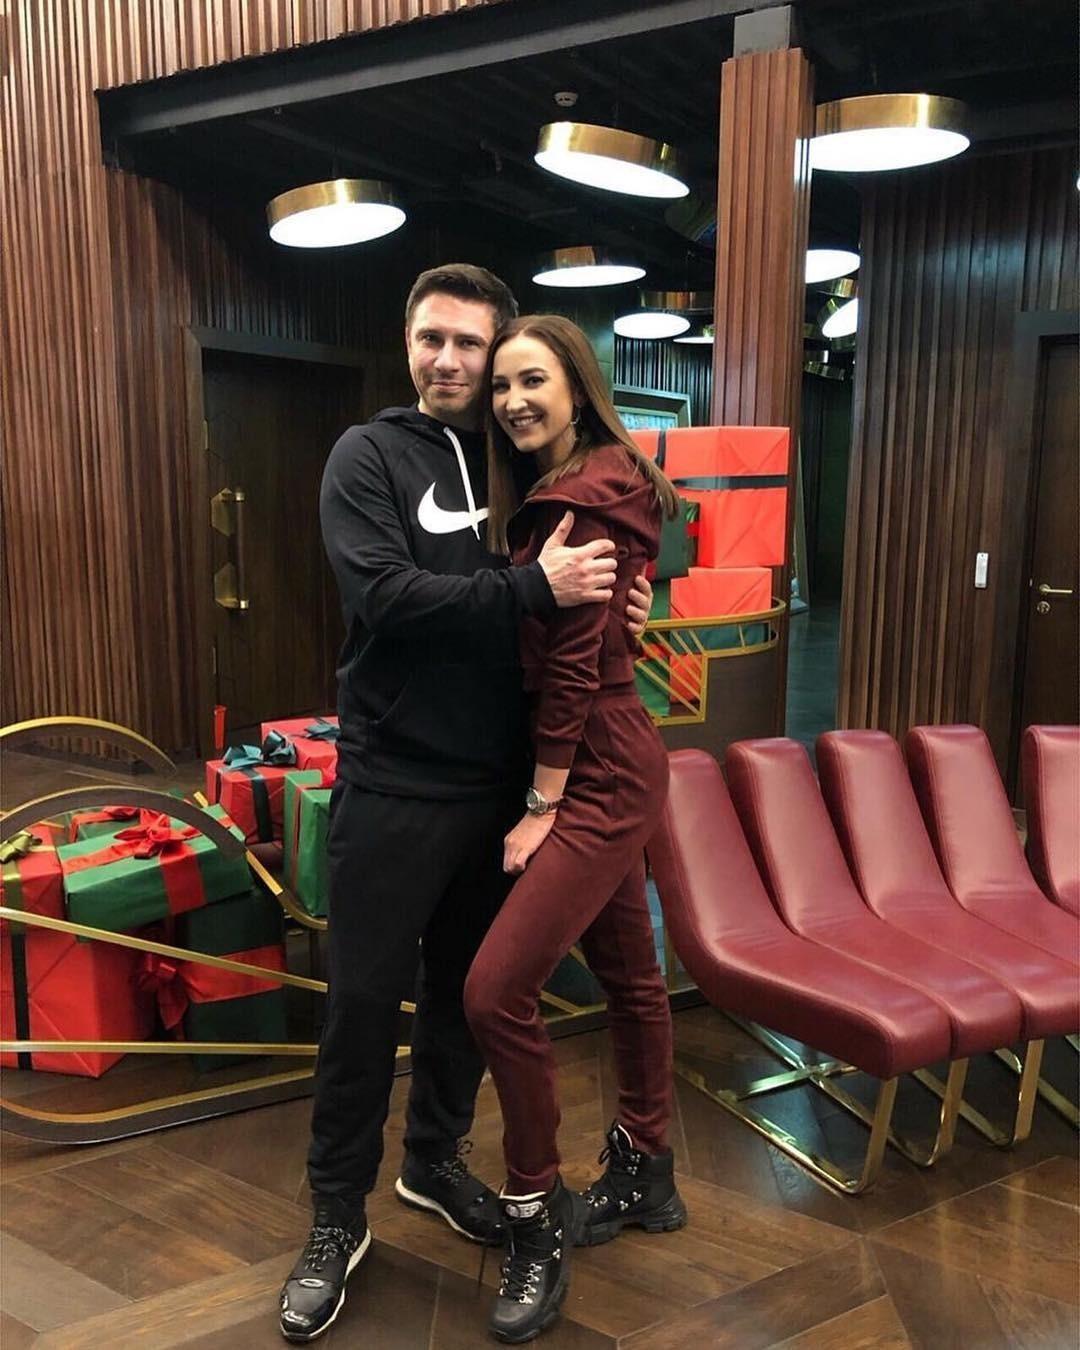 Ольга Бузова опубликовала новое фото в объятиях Тимура Батрутдинова